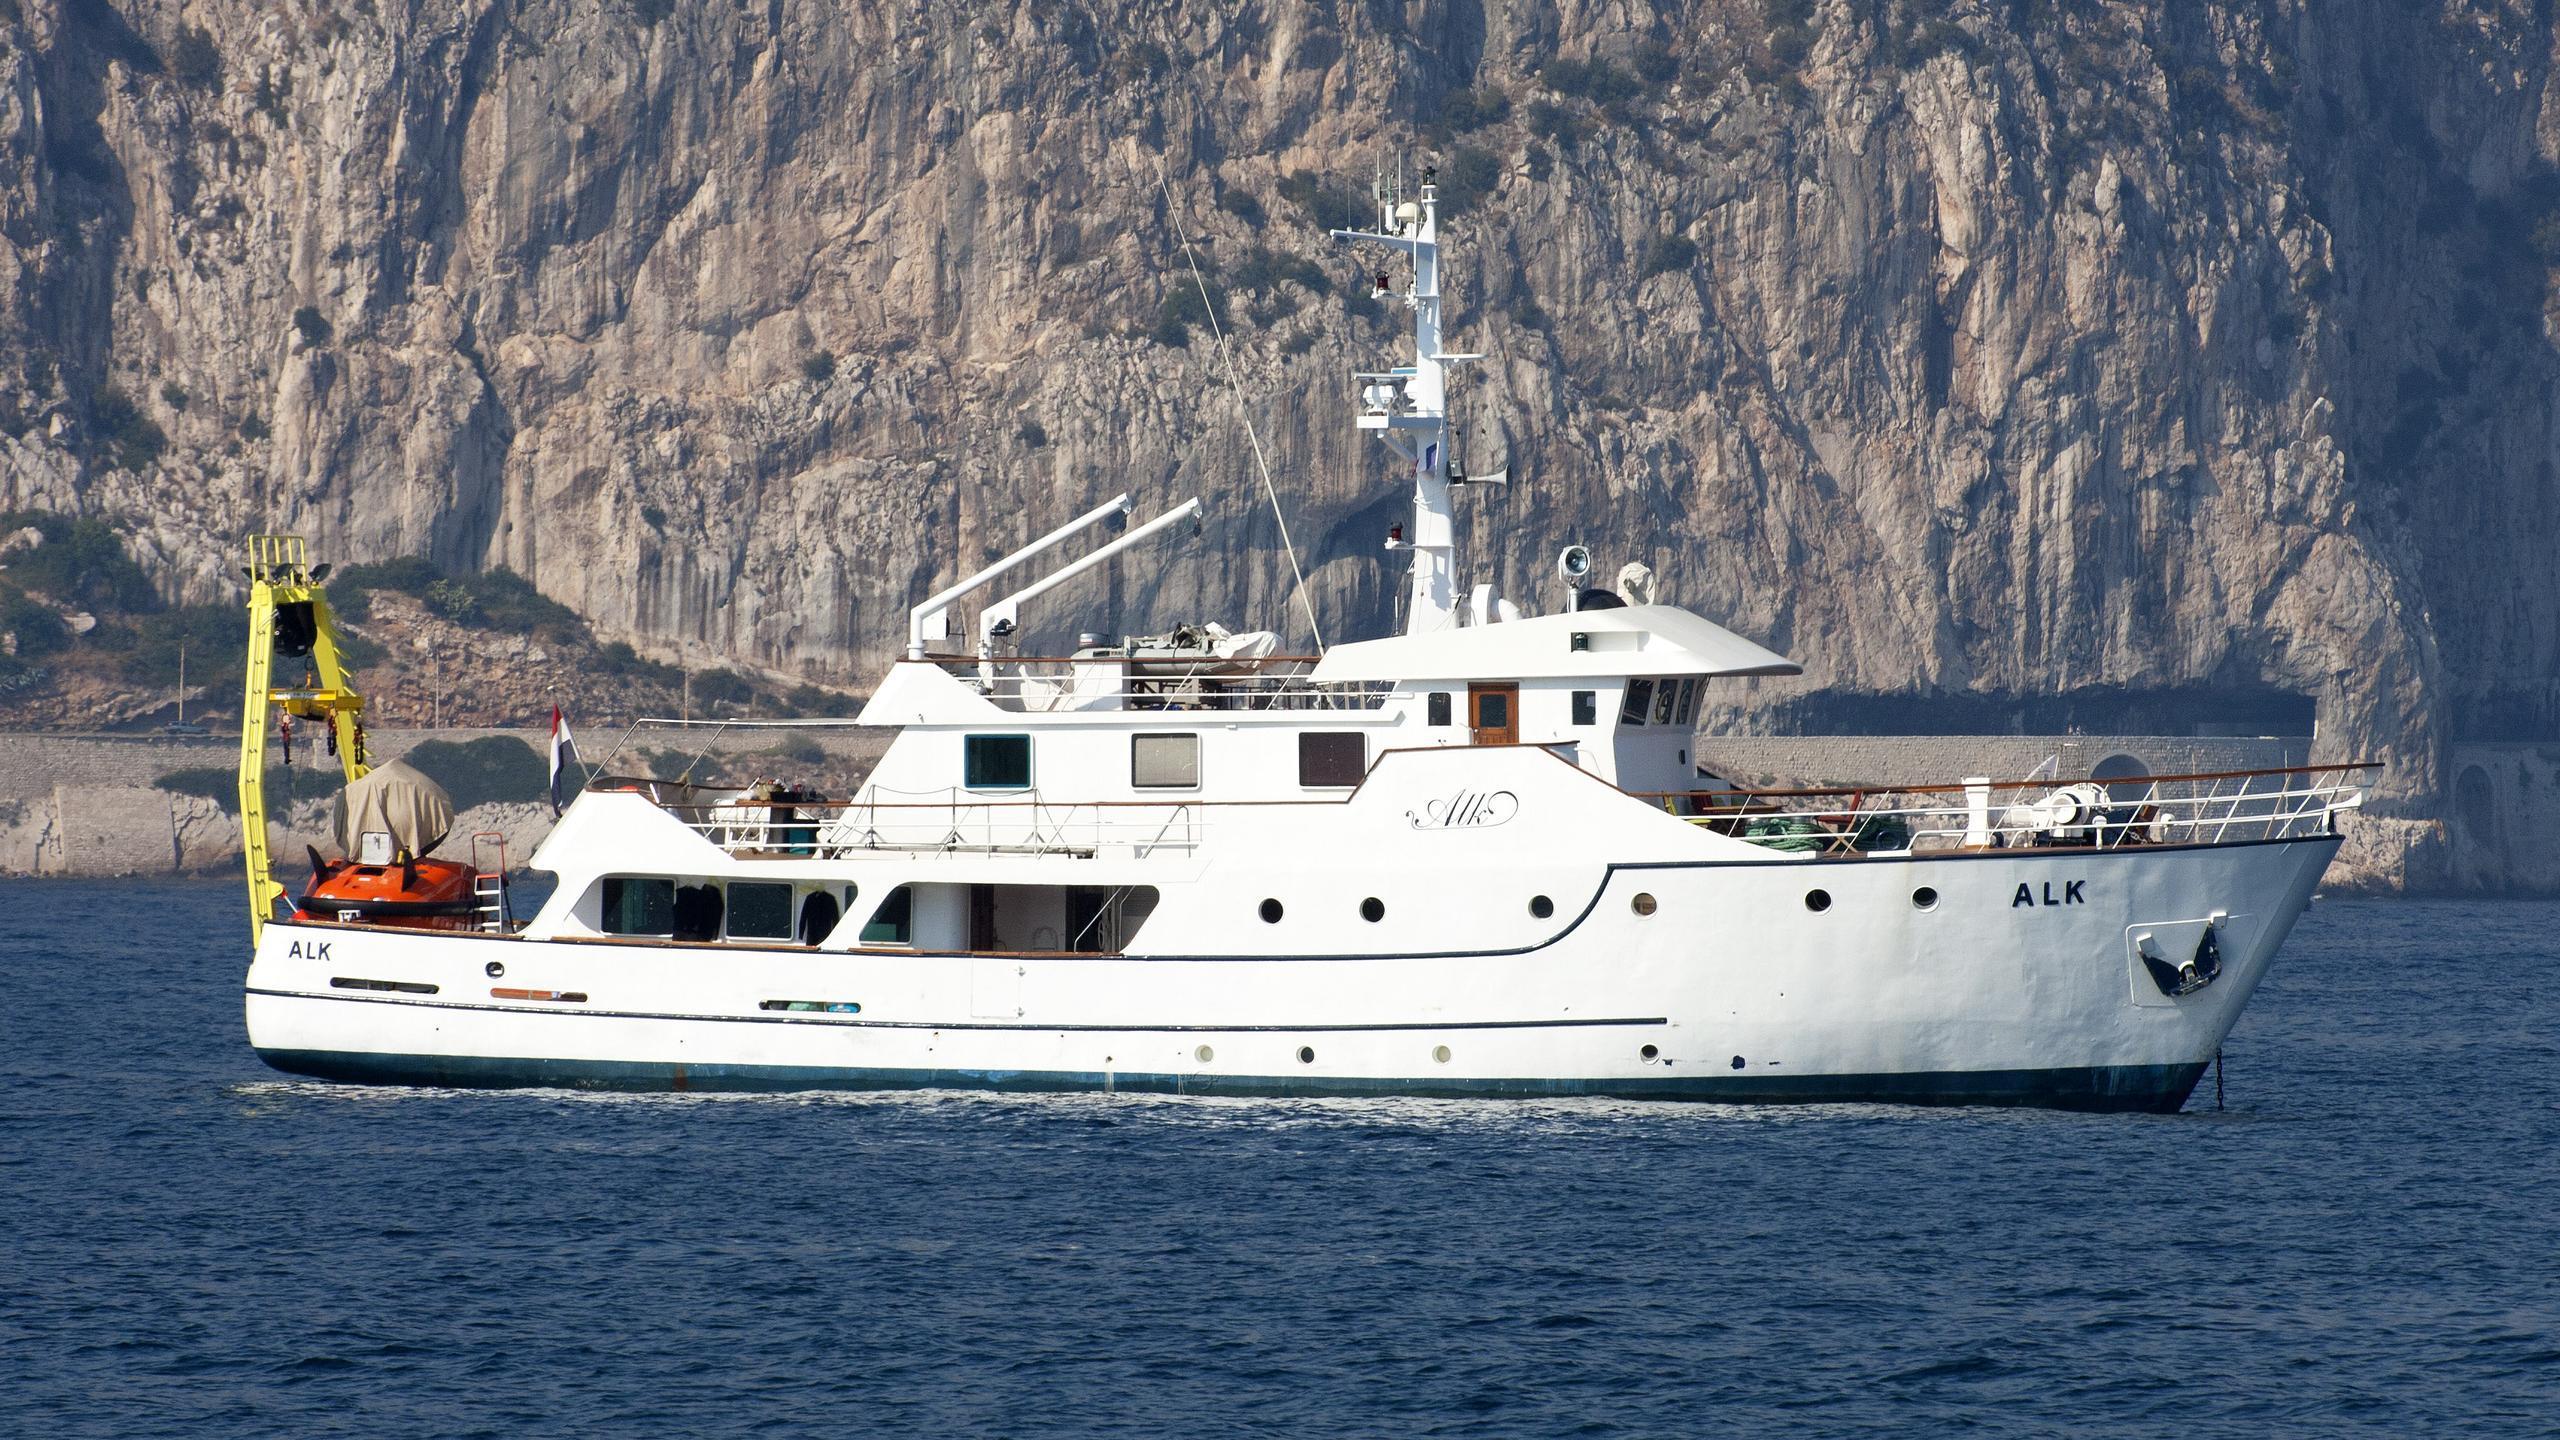 alk-explorer-yacht-hitzler-1965-31m-profile